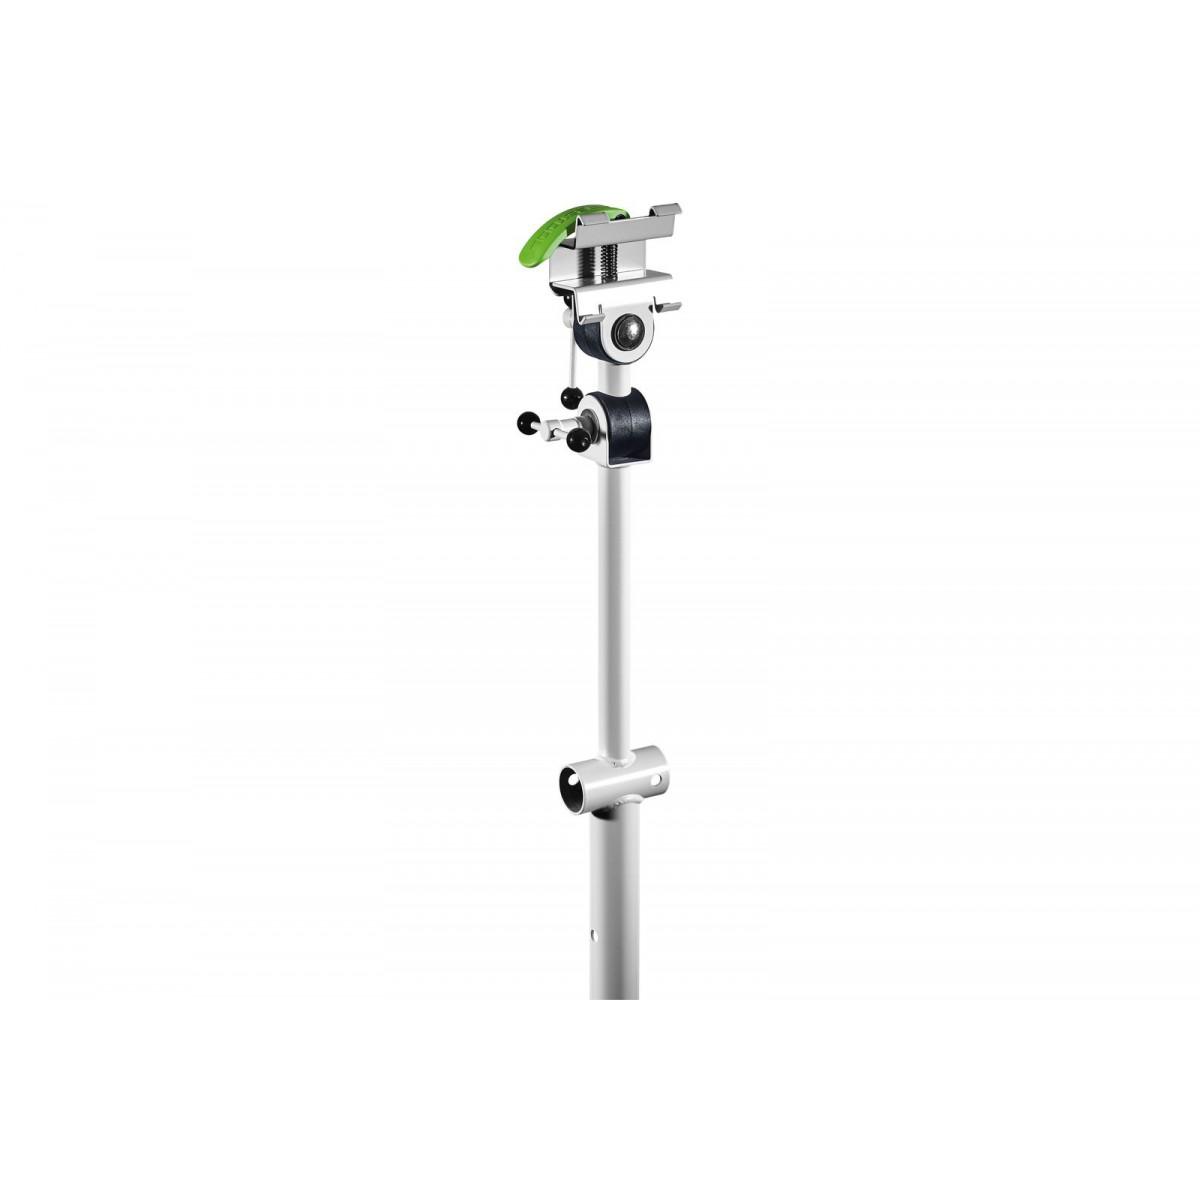 Festool FES-201936  SysLite STL 450 Tripod Adapter AD-ST DUO 200